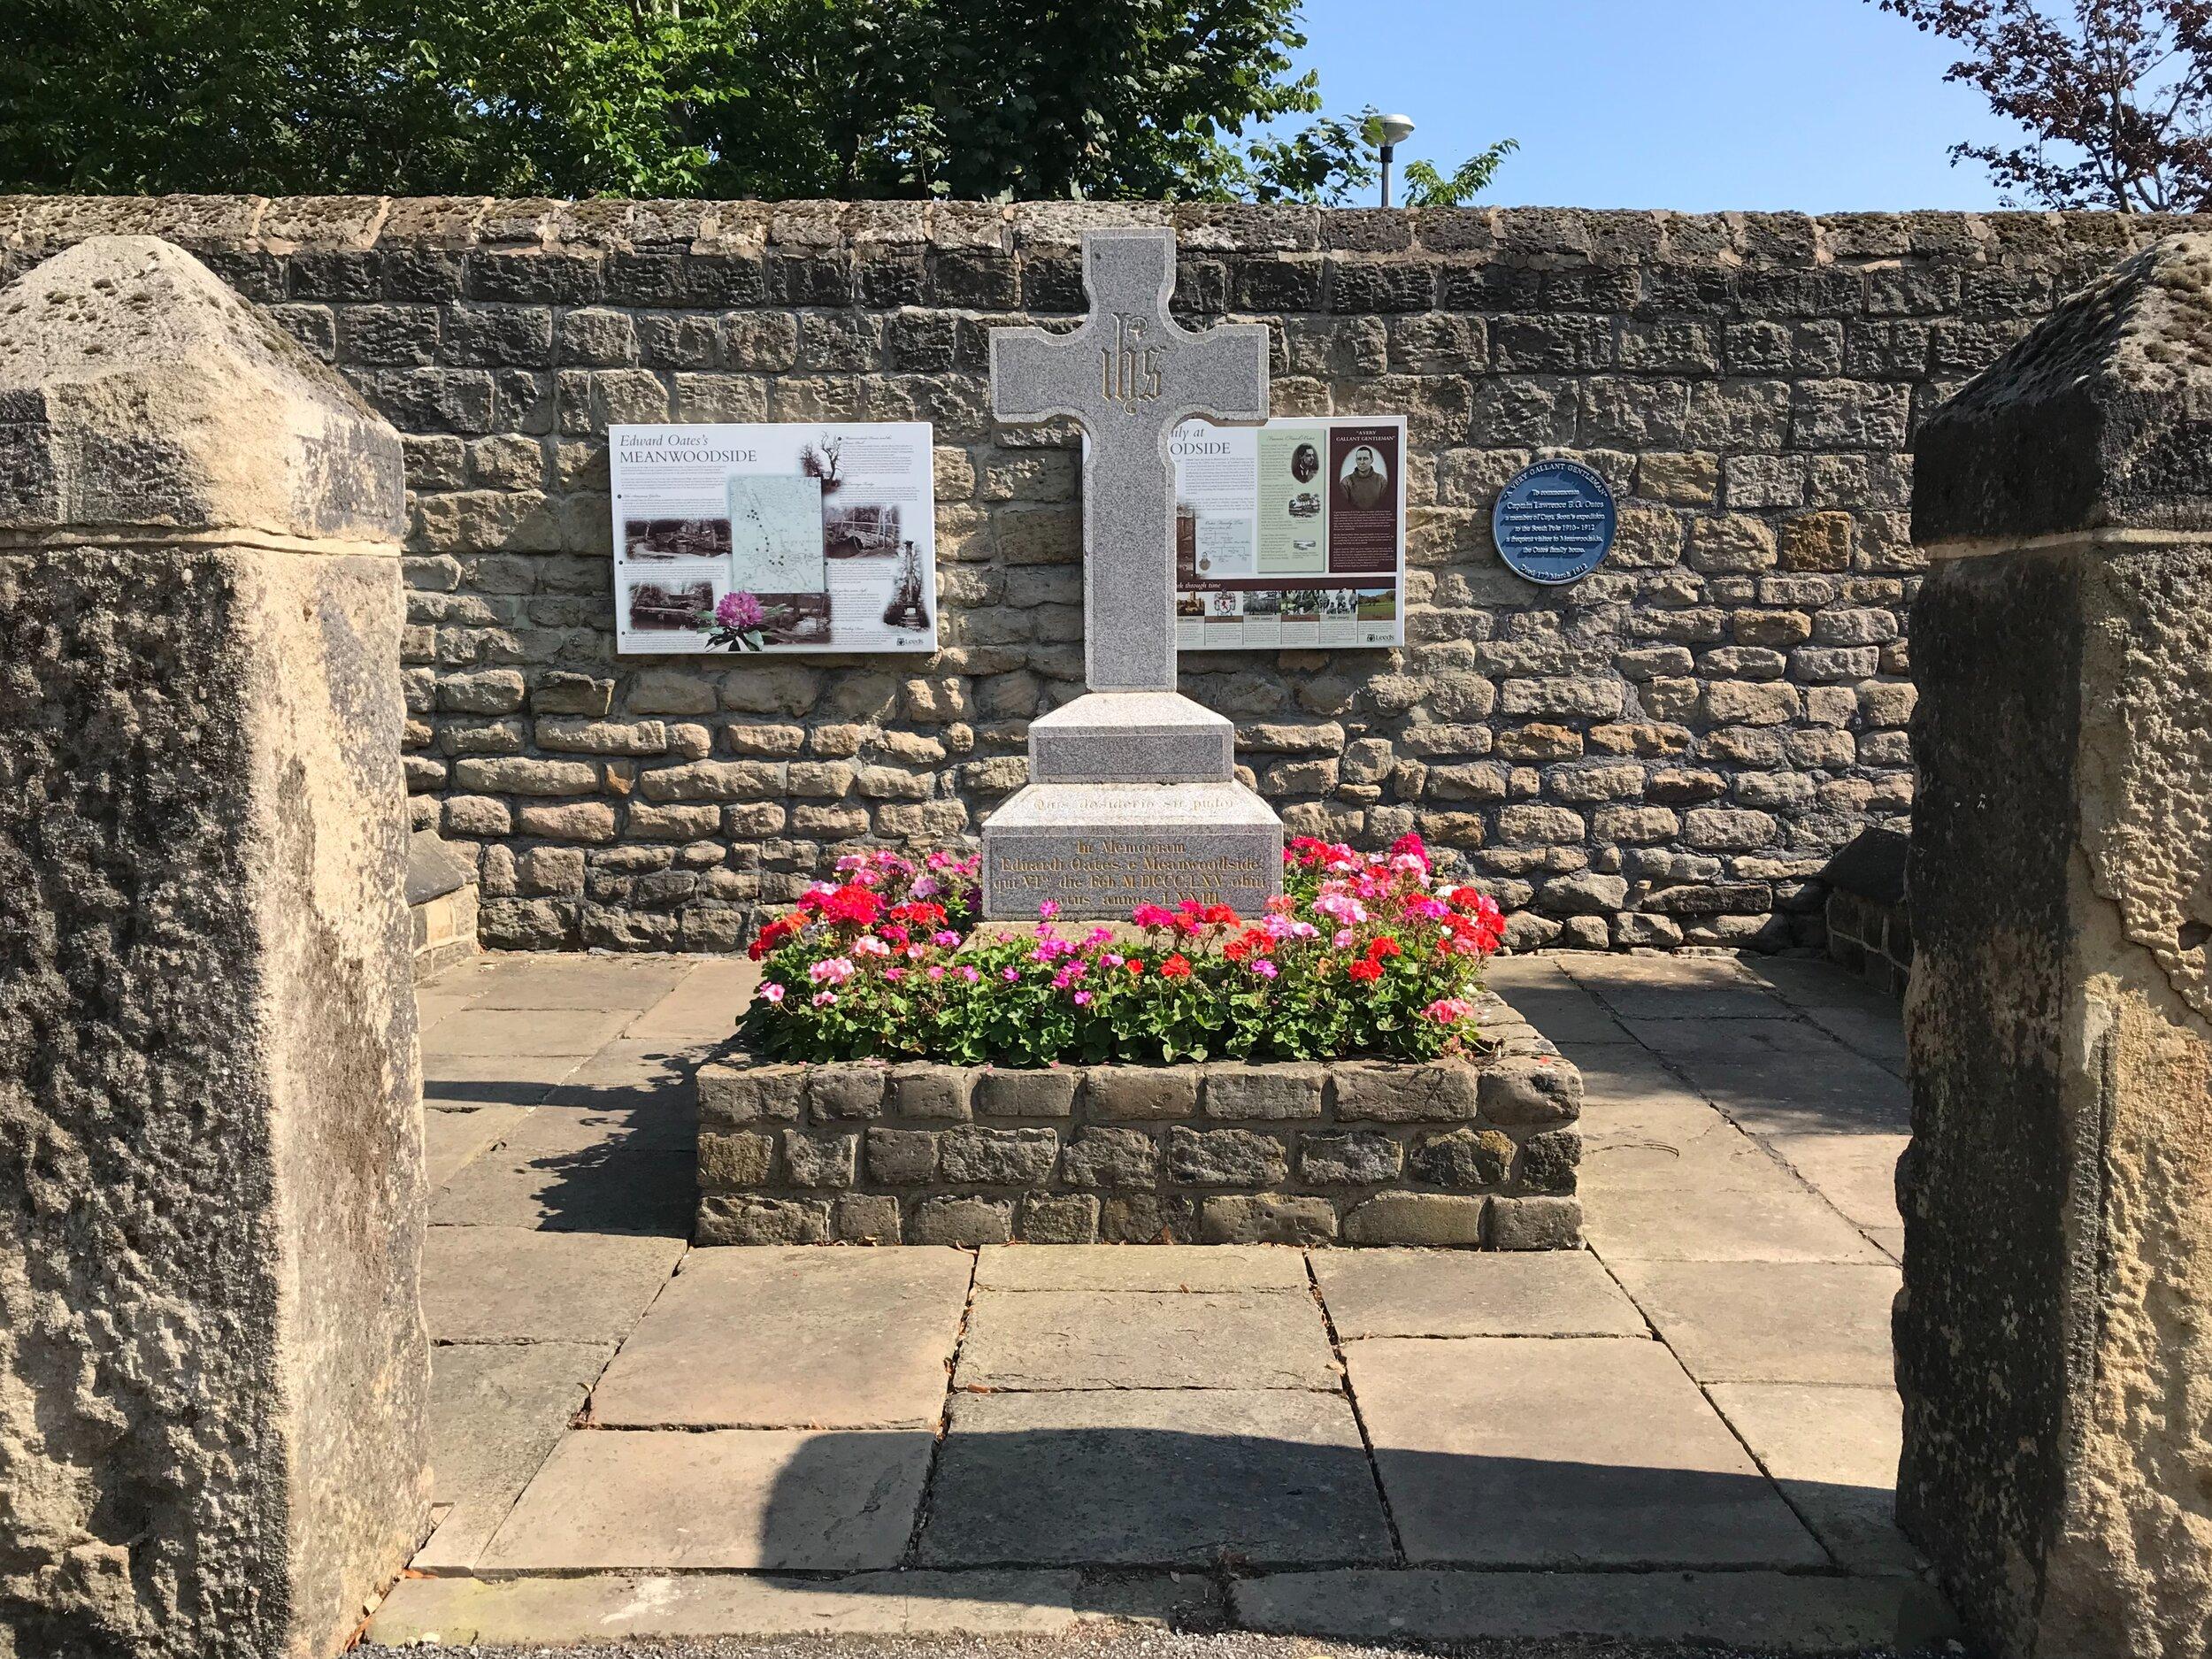 Oates Memorial, Meanwood Park © HP